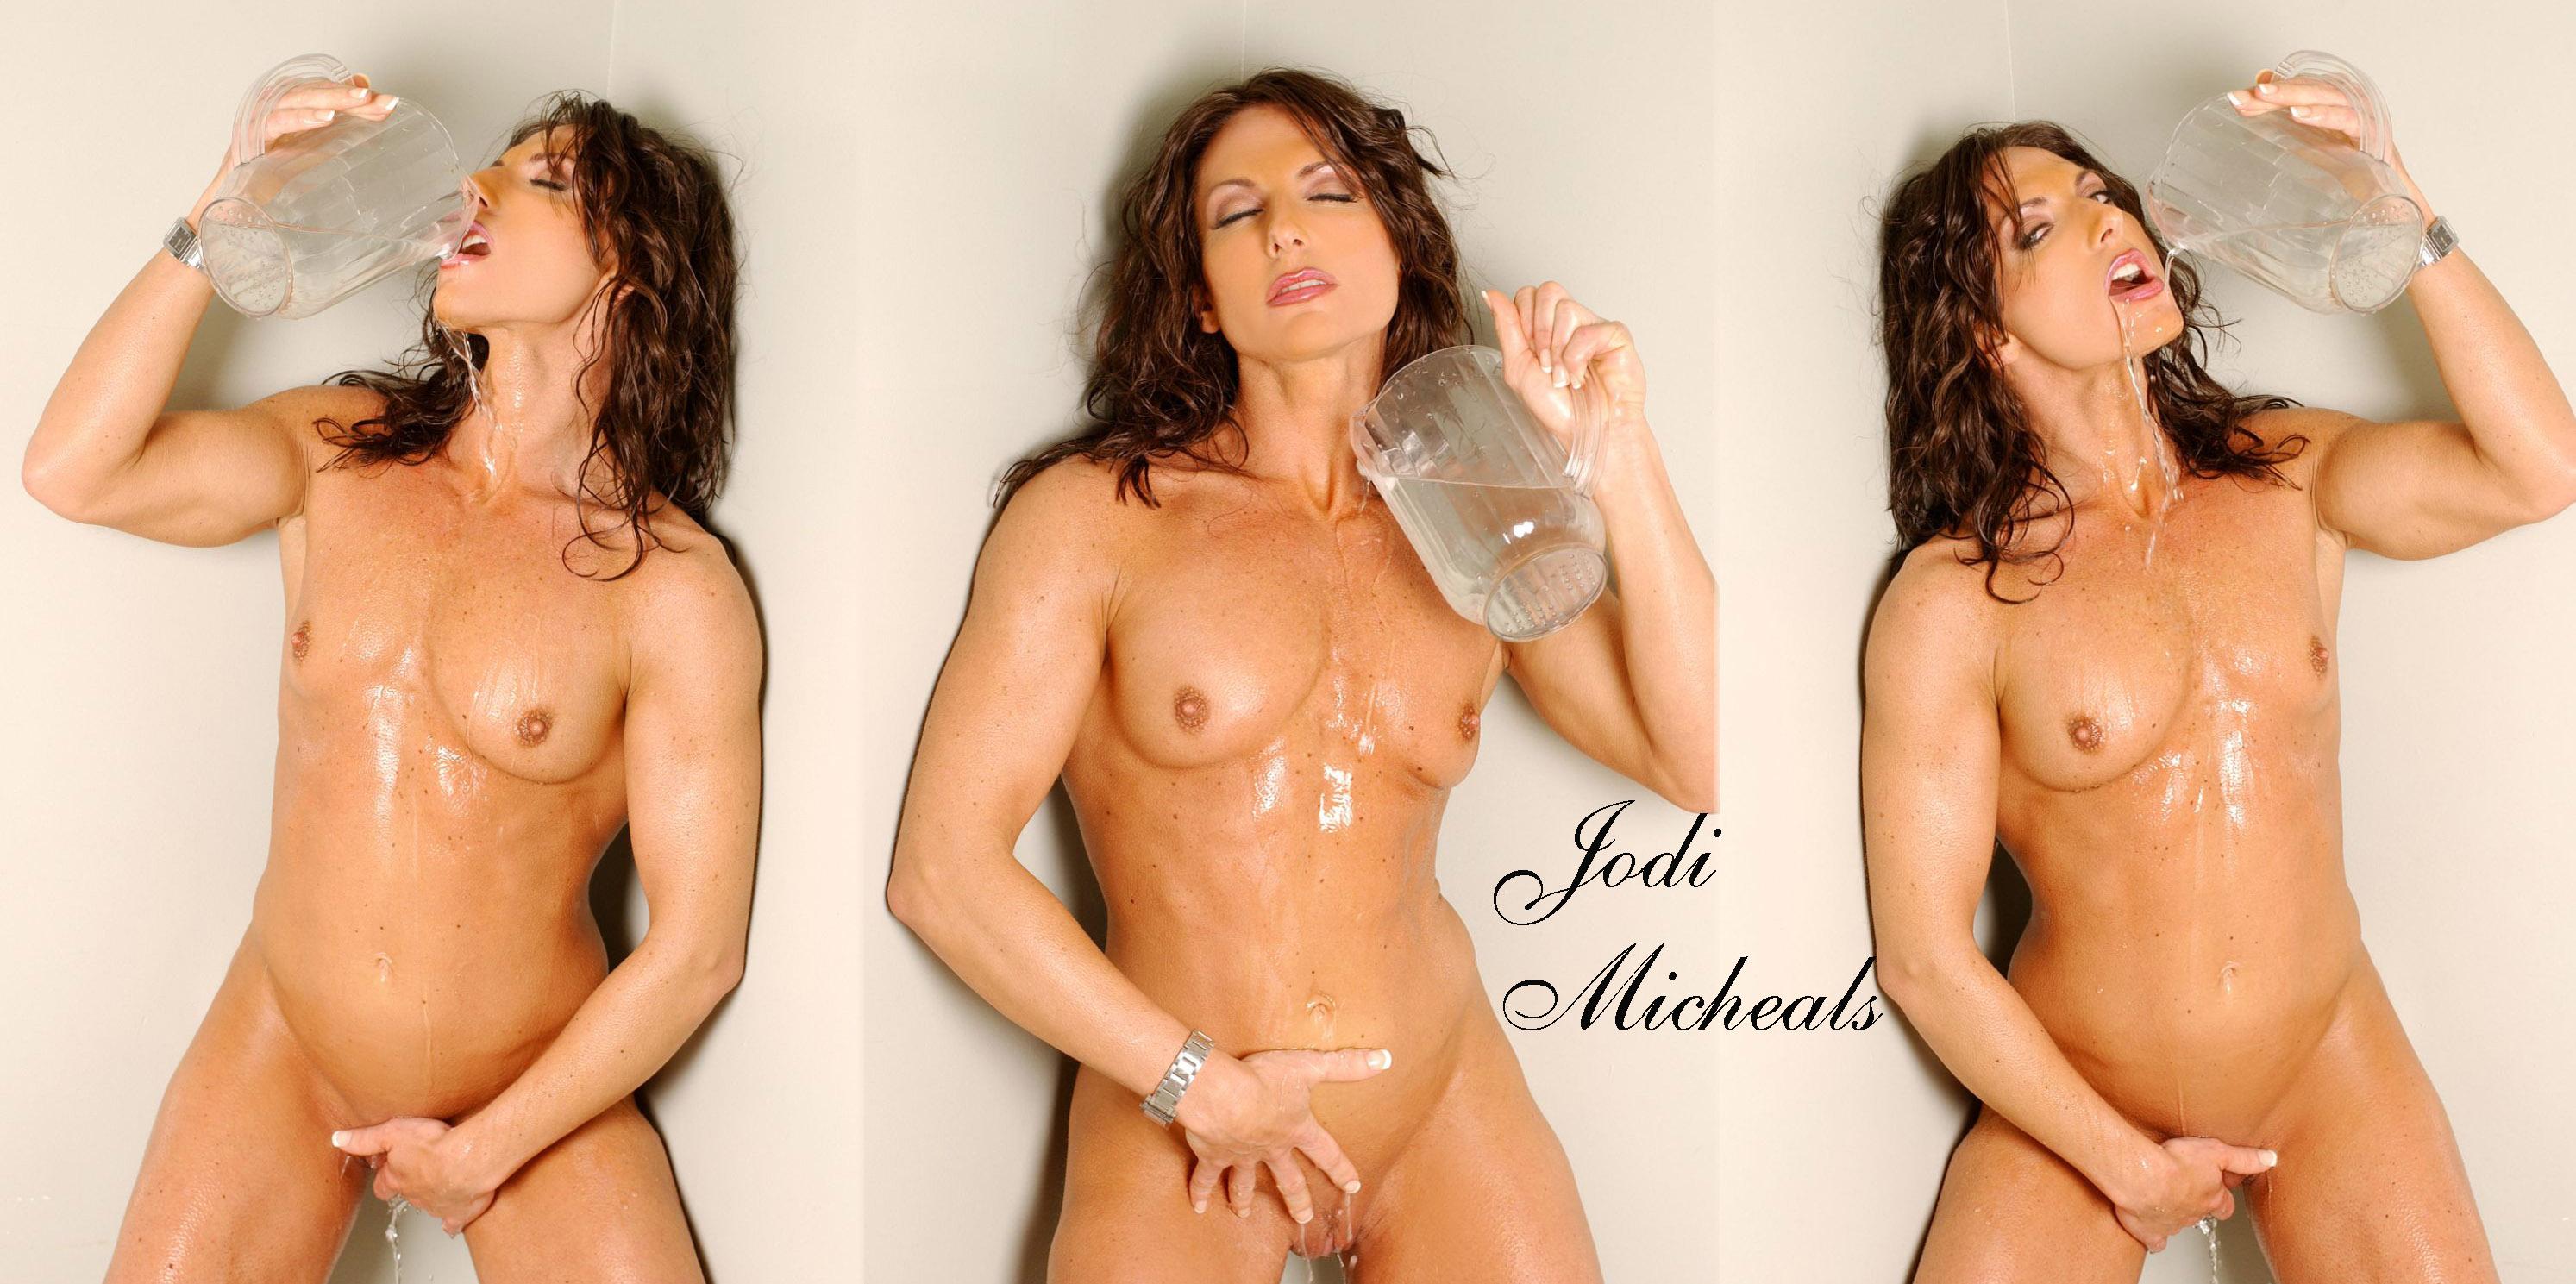 Peliculas Porno De Alesha Nasa trina the baddest chick naked hot brunette finds the